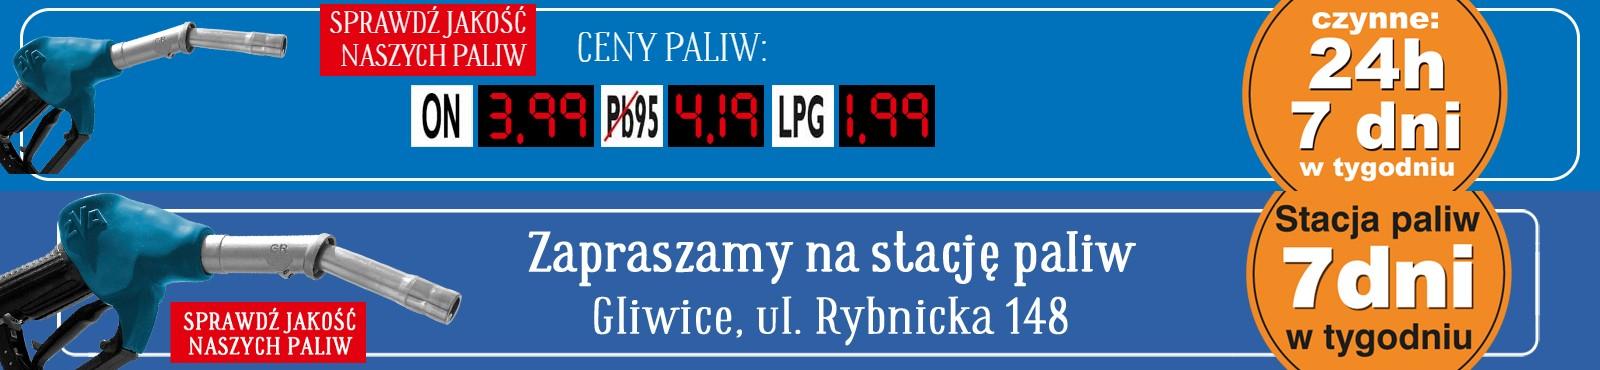 Gliwice E.Leclerc paliwo ON 3,99 / Pb95 4,19 / LPG 1,99